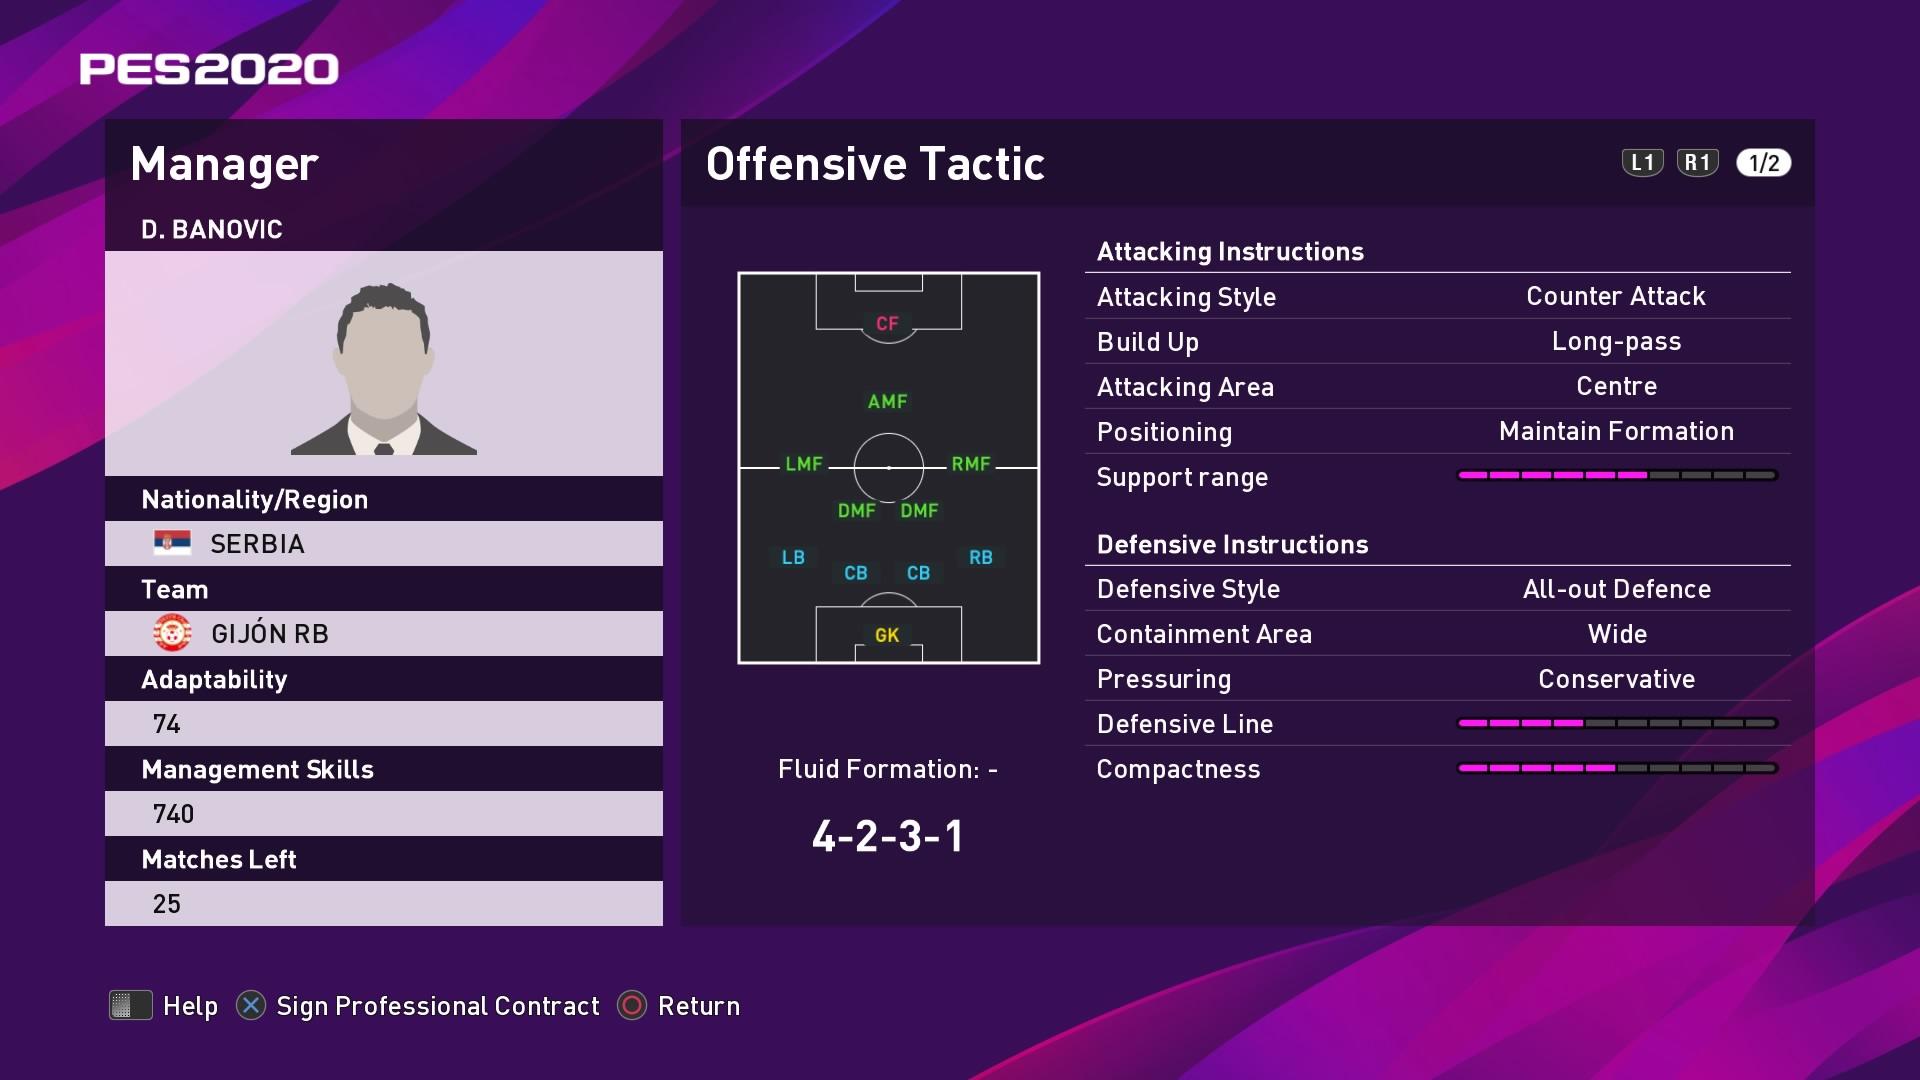 D. Banovic (Miroslav Đukić) Offensive Tactic in PES 2020 myClub